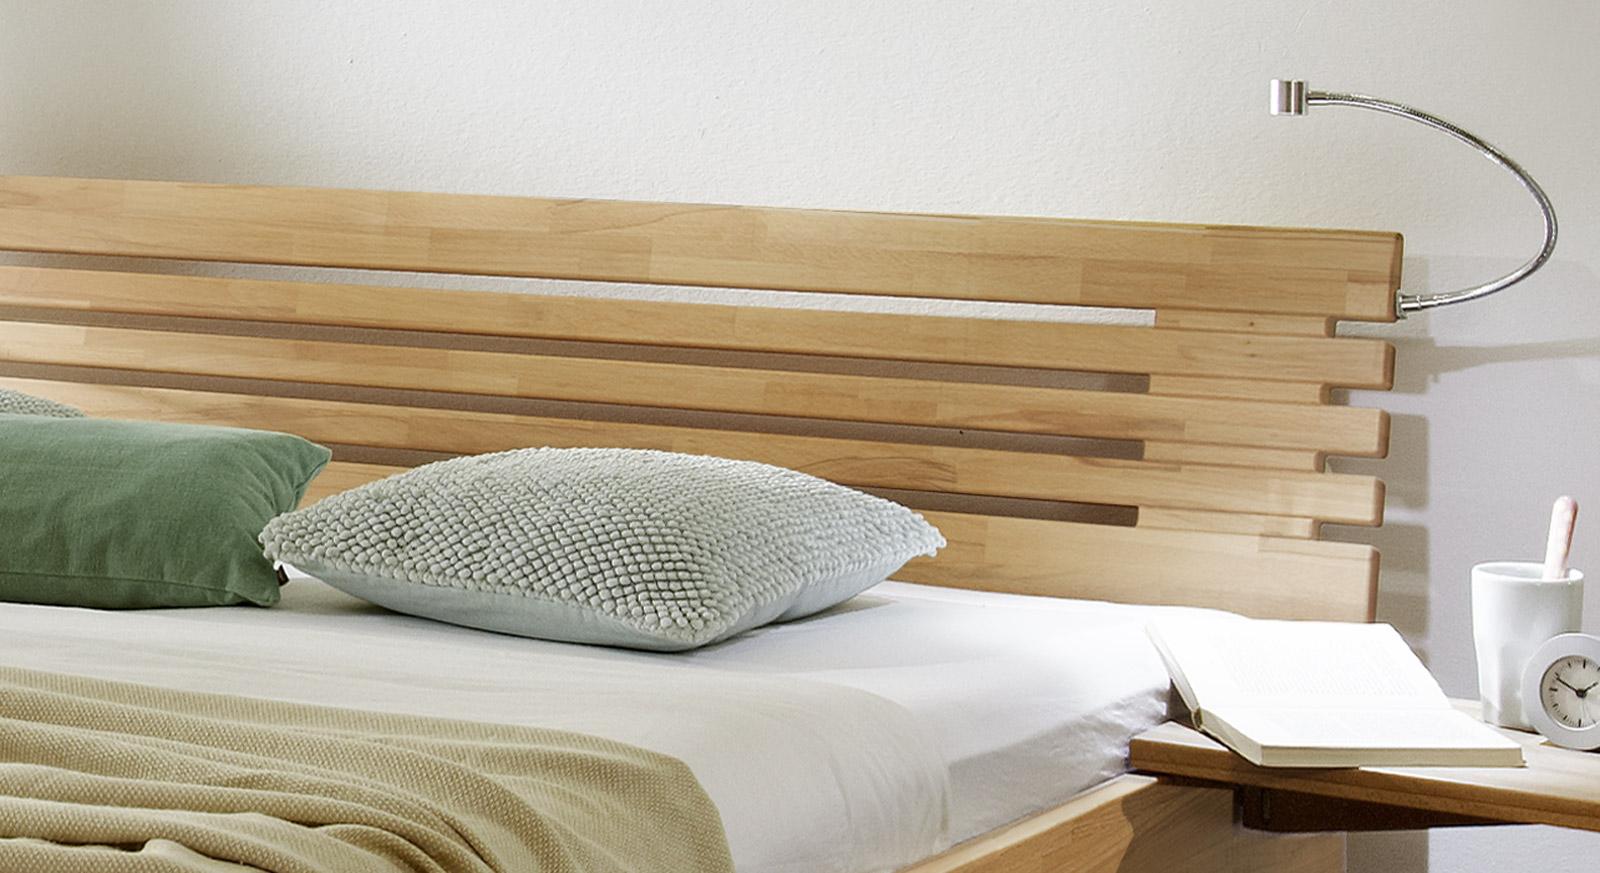 Massivholzbett Marmore mit modernem Sprossenkopfteil